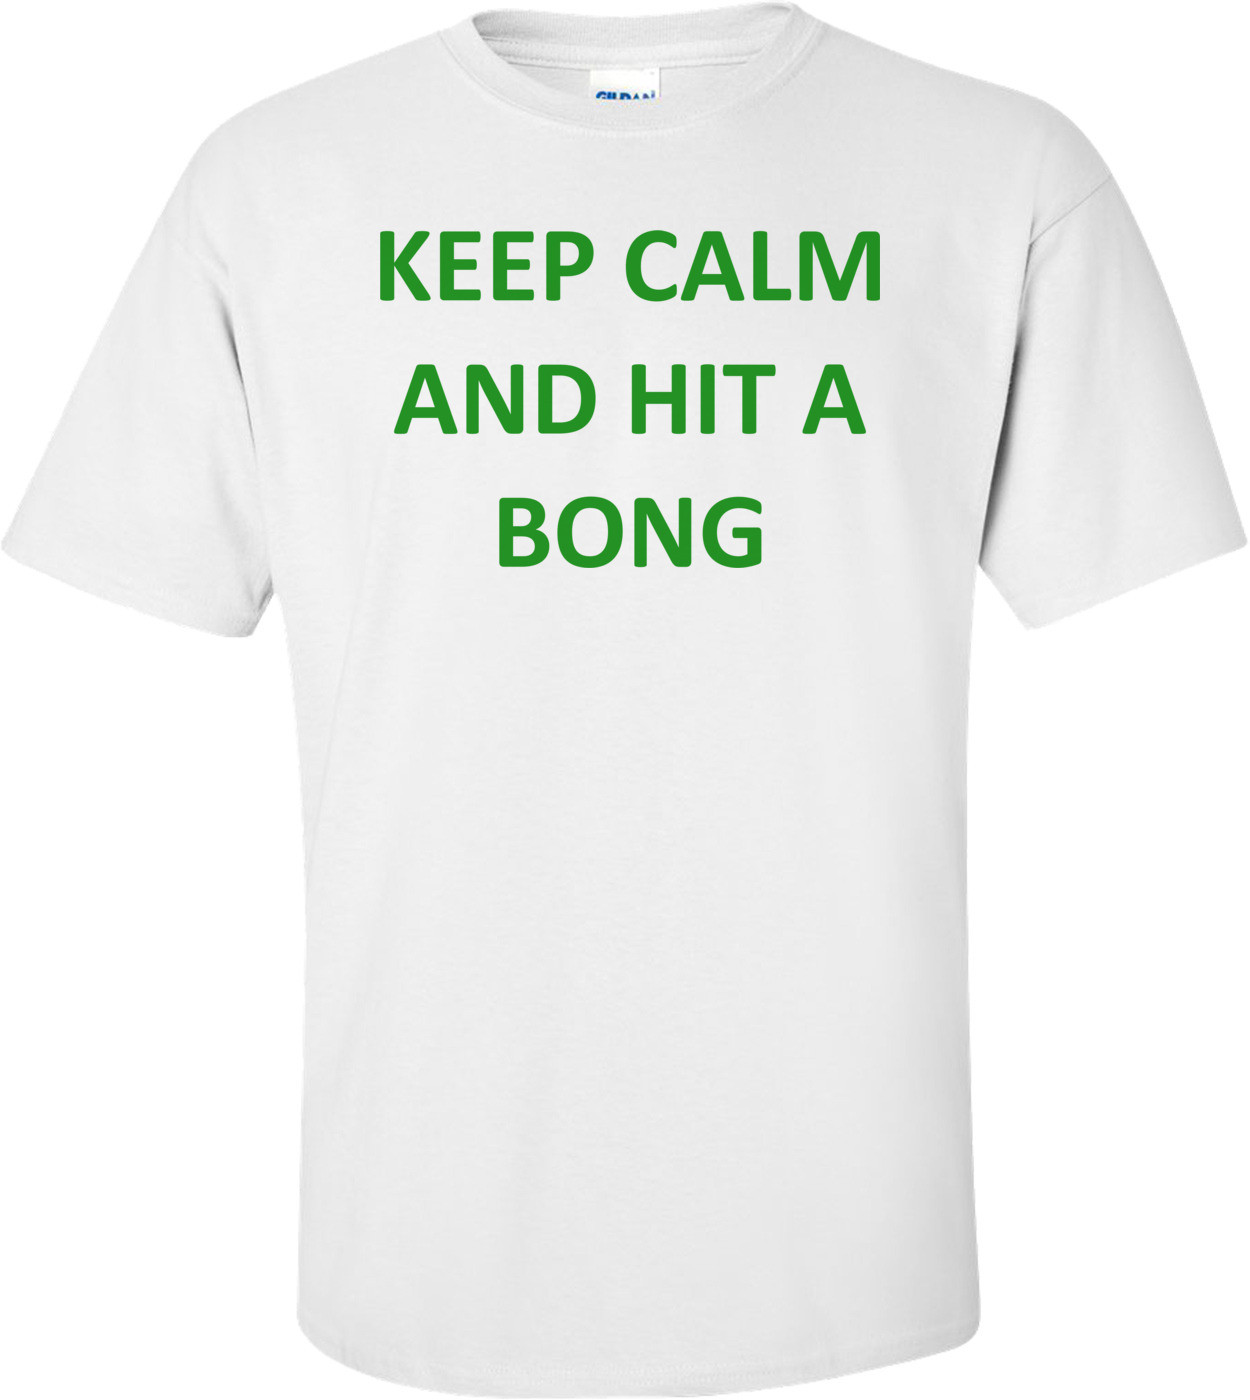 KEEP CALM AND HIT A BONG Shirt